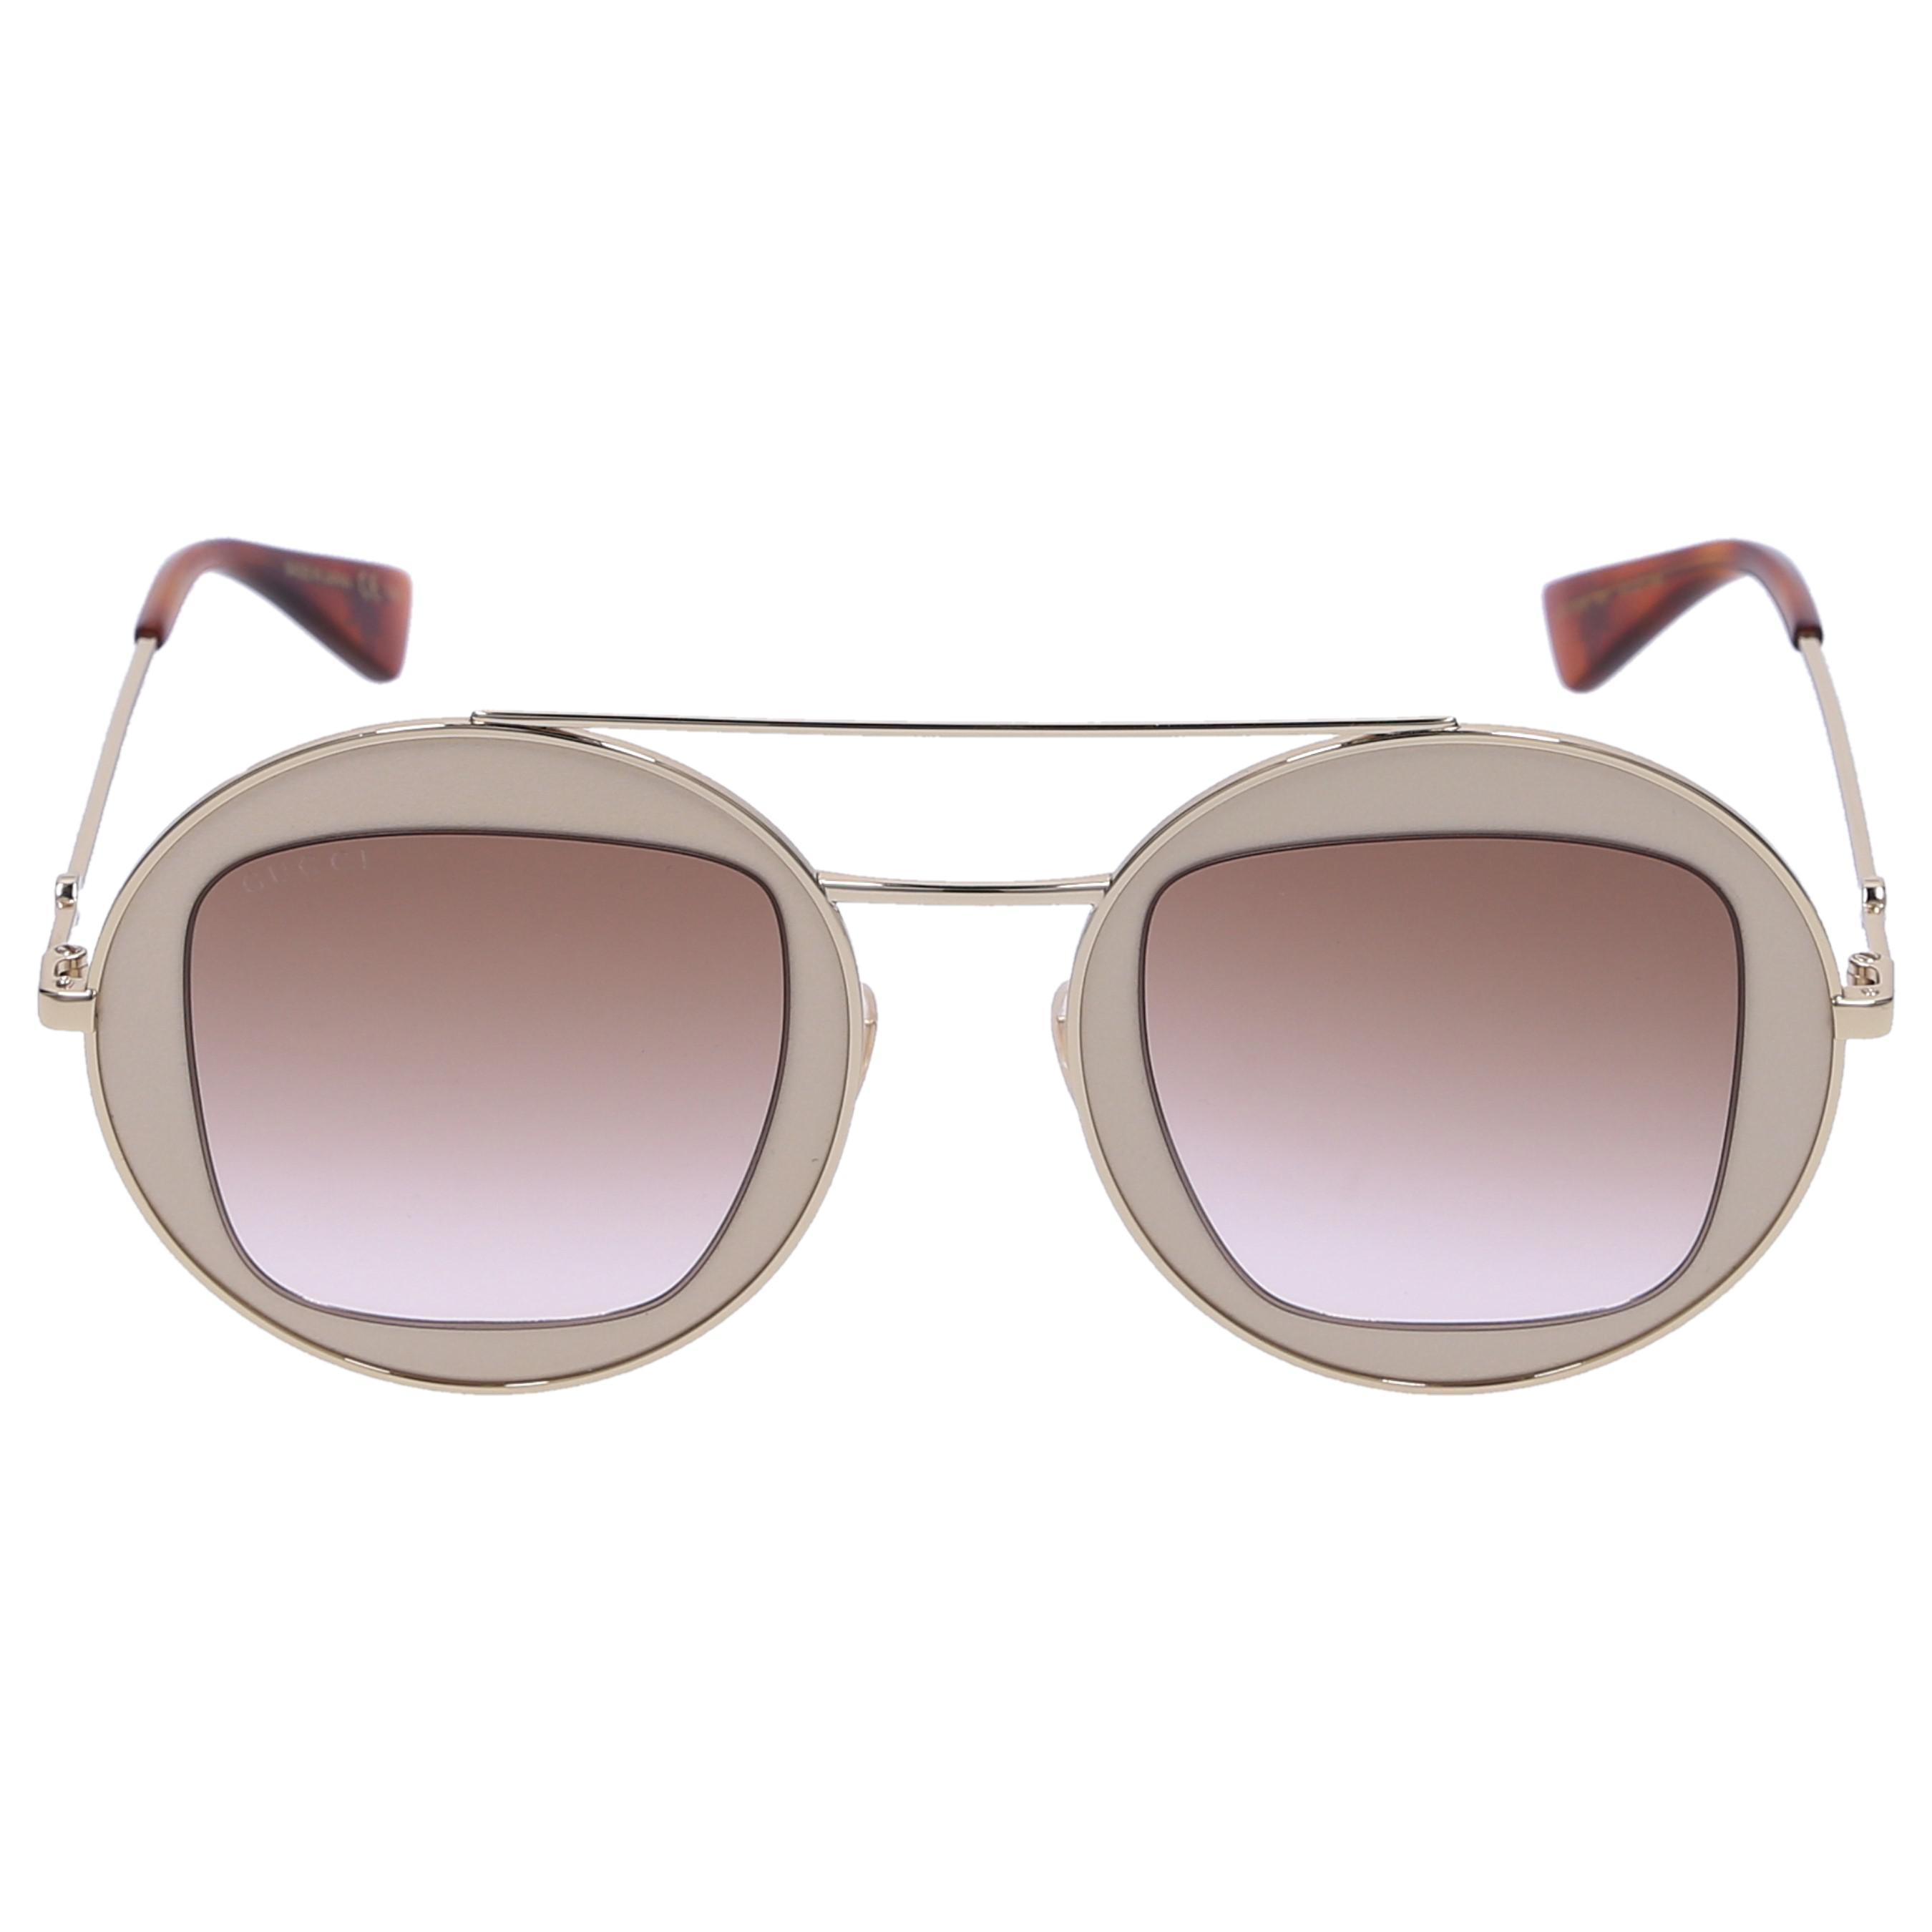 9020a1e663 Gucci Women Sunglasses Aviator 105s Titan Gold - Lyst